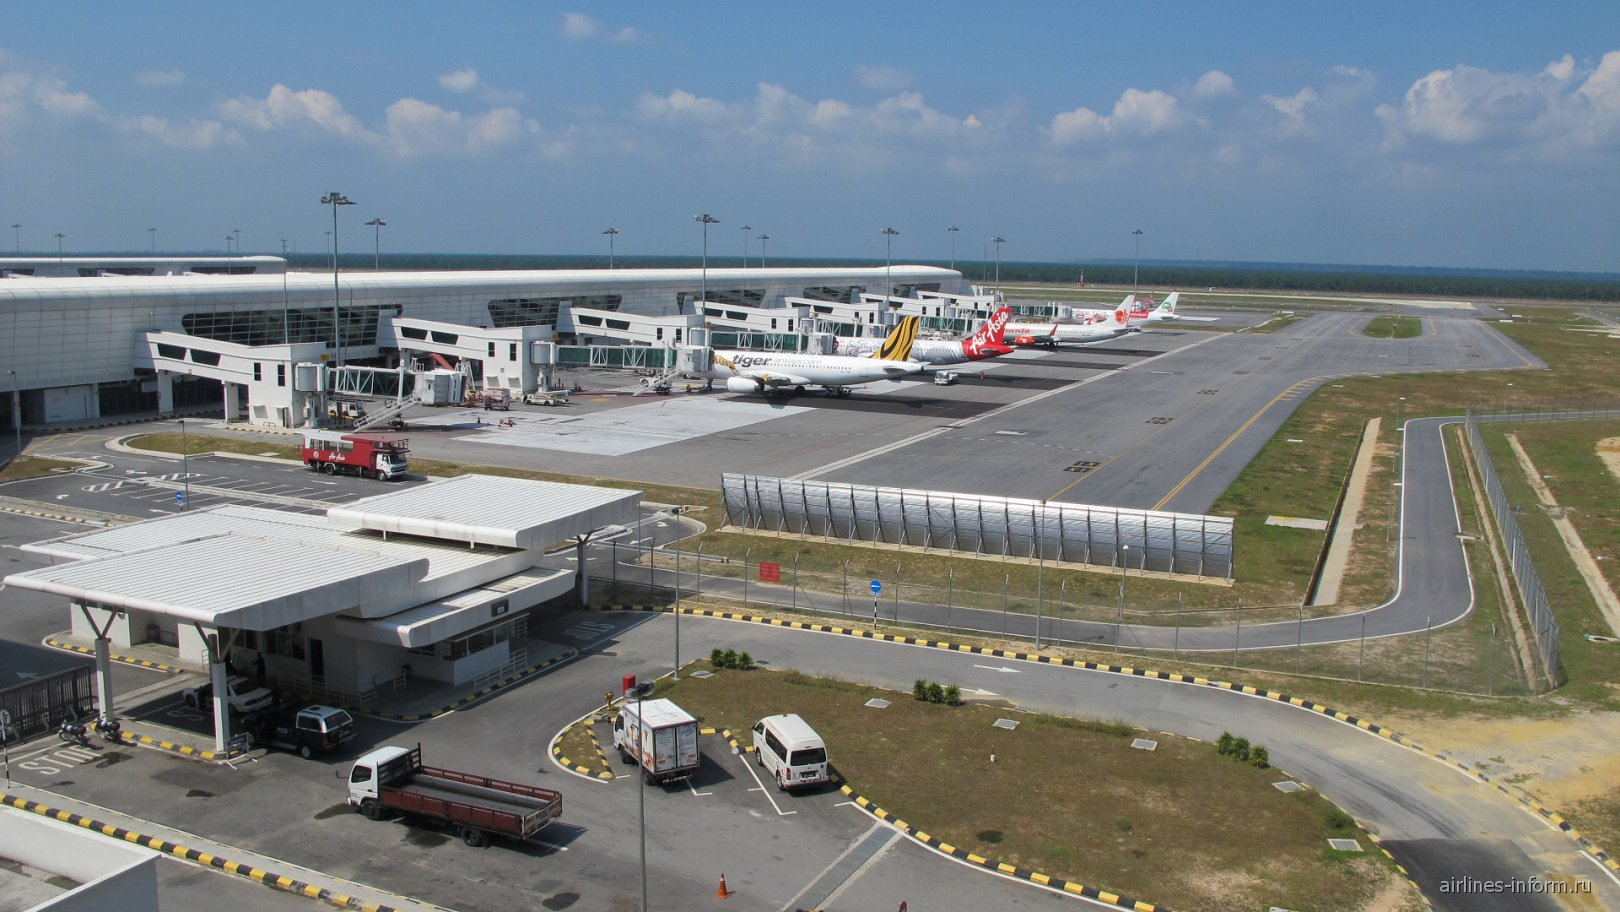 Самолеты у лоукост-терминала KLIA2 аэропорта Куала-Лумпур